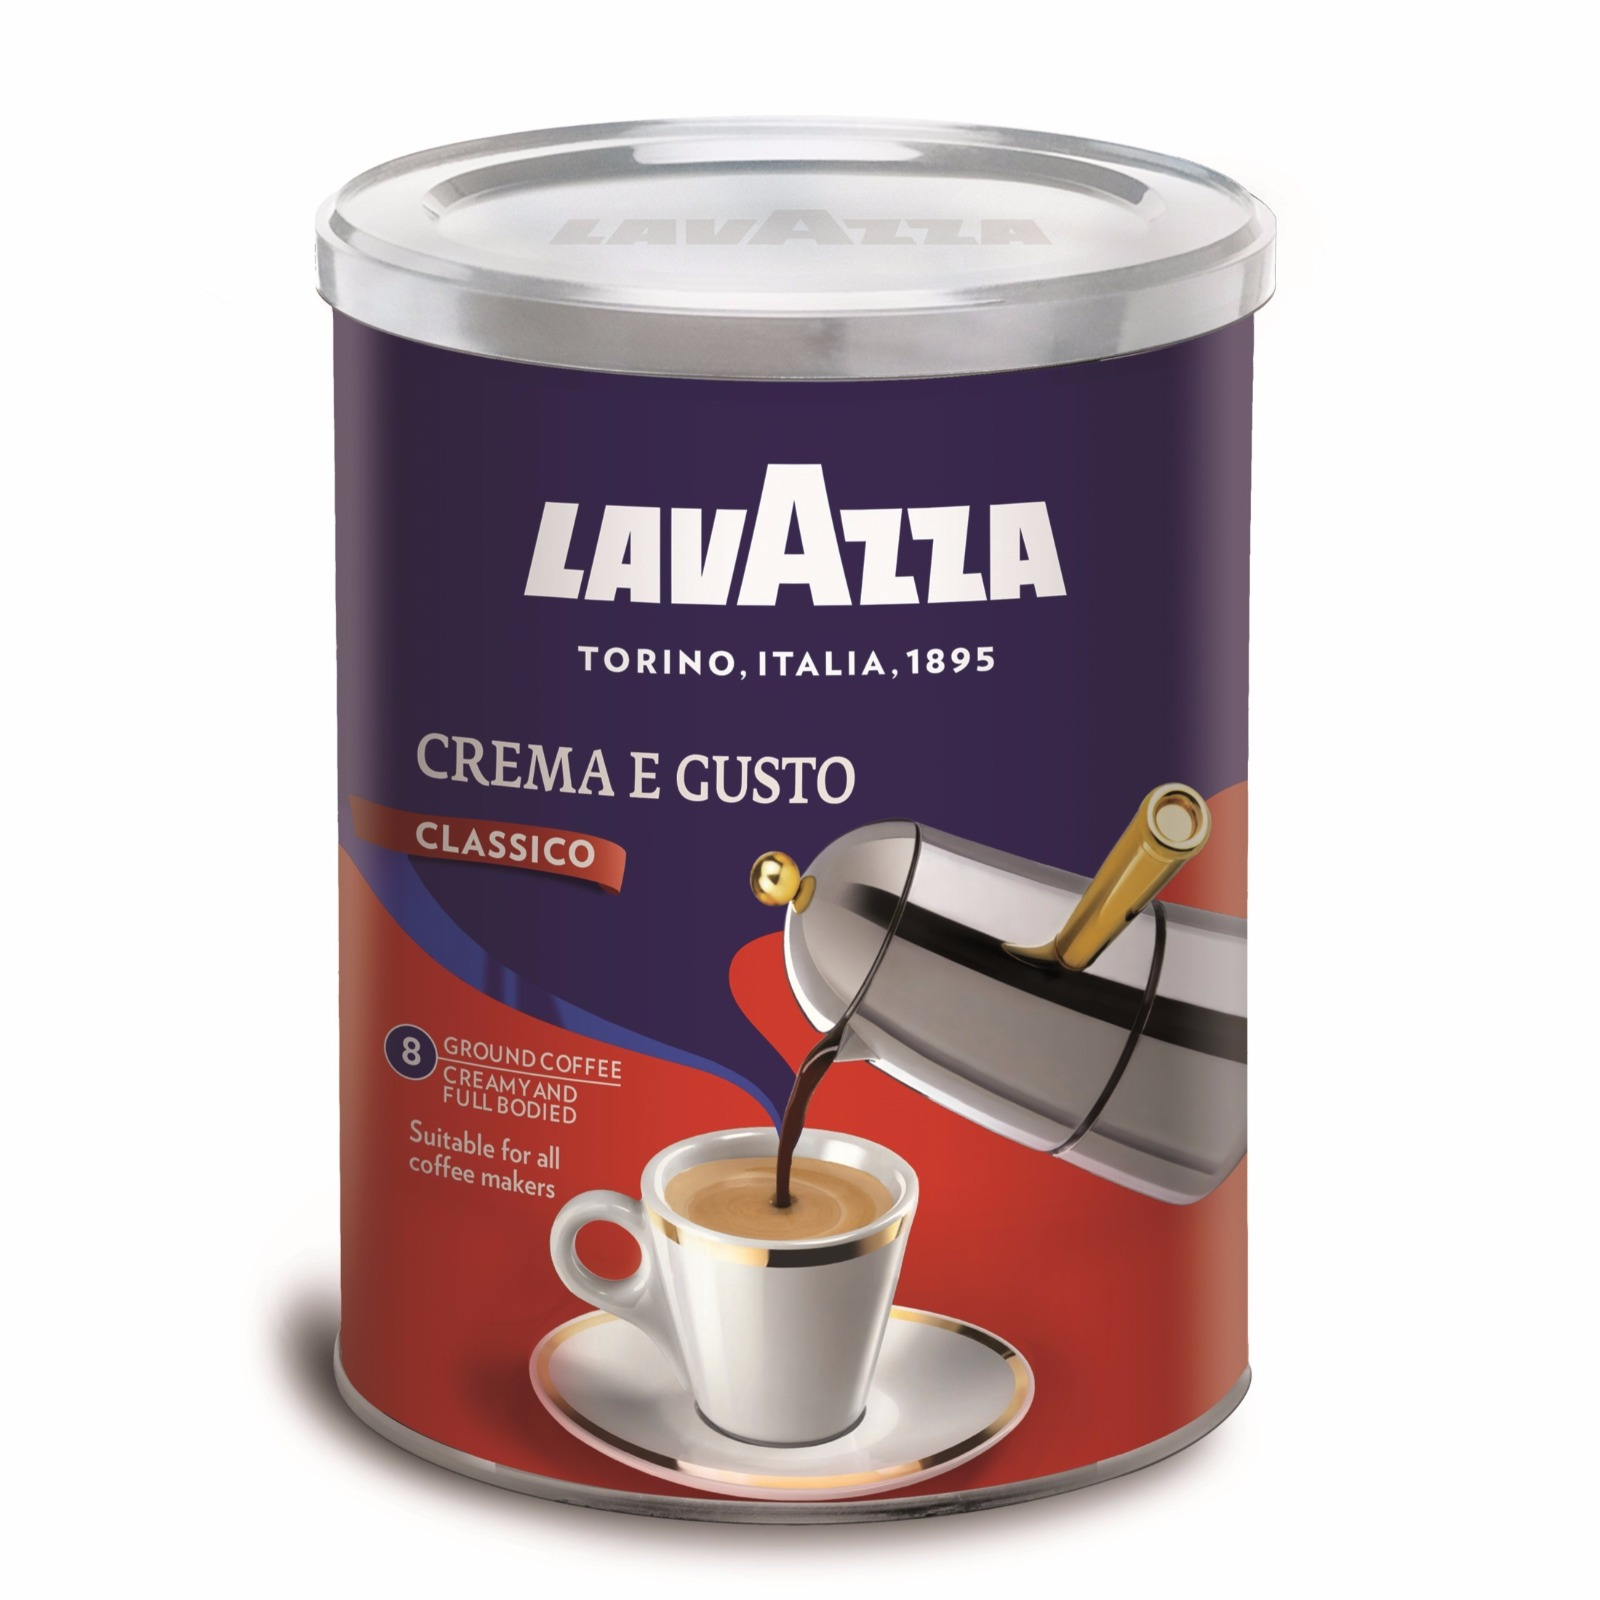 кофе лавацца крема густо